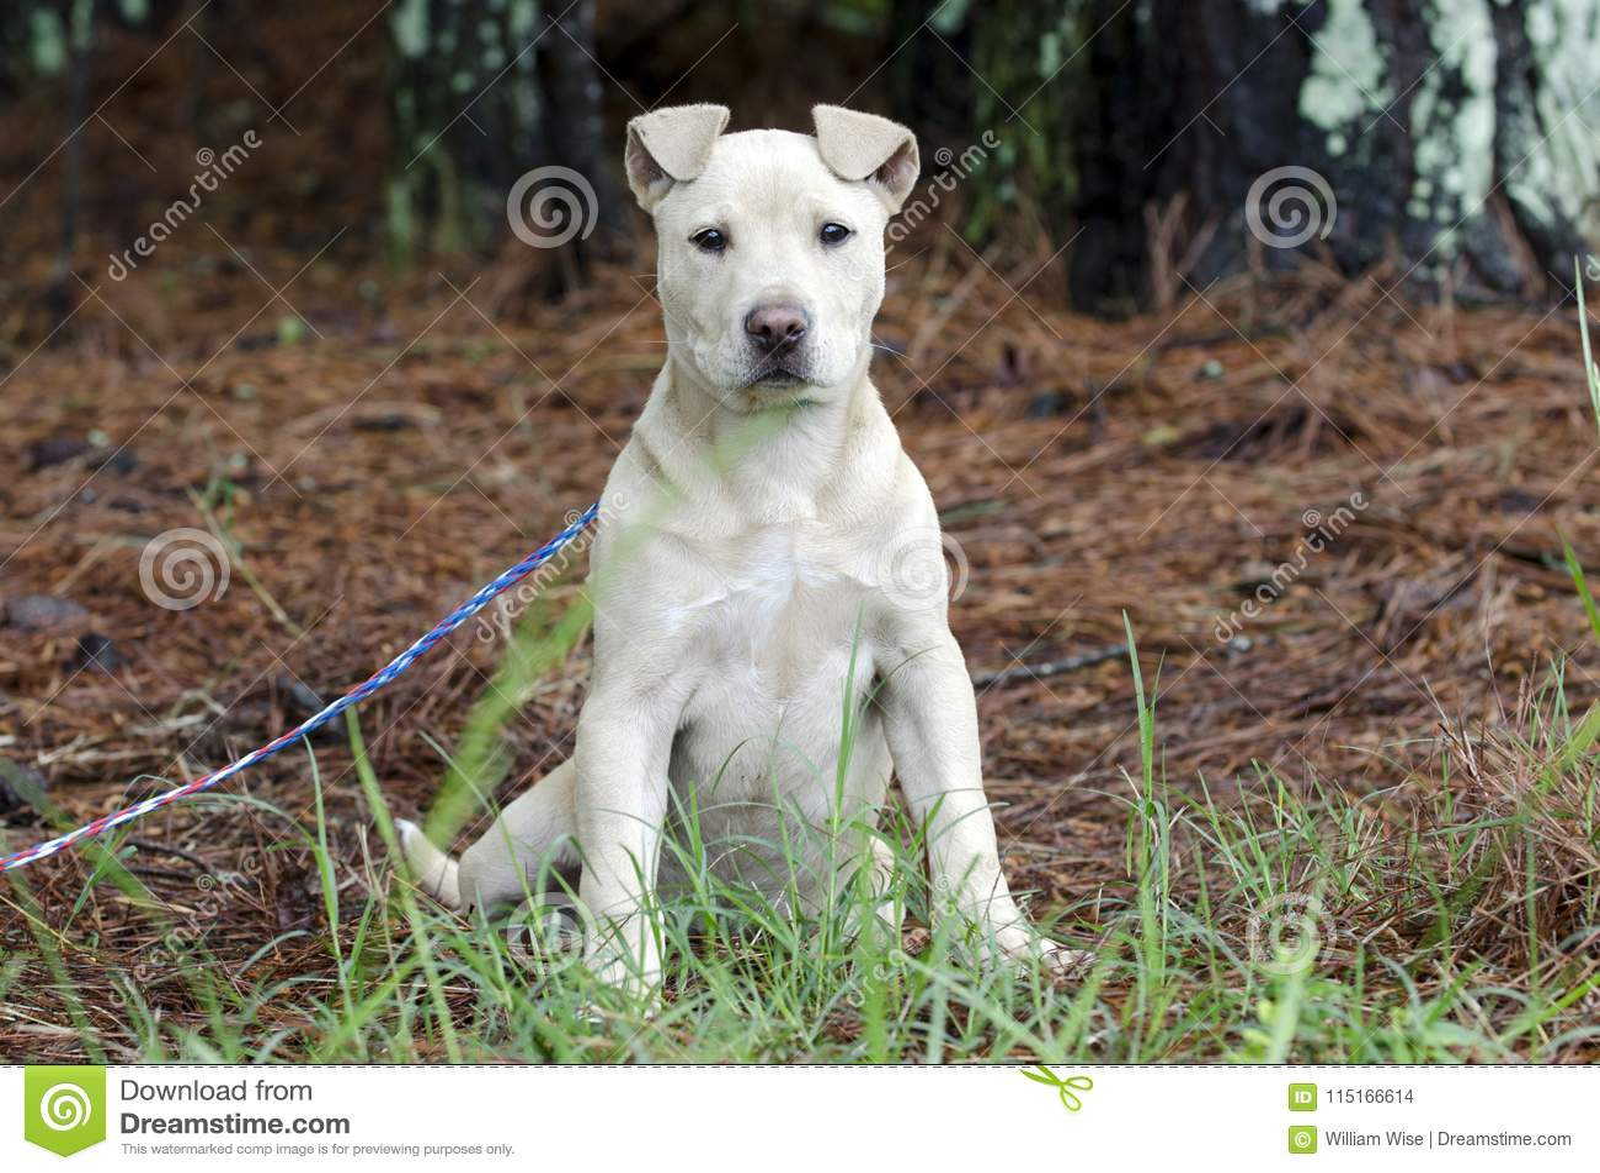 Fawn Pitbull Puppy Dog, Pet Rescue Adoption Photography